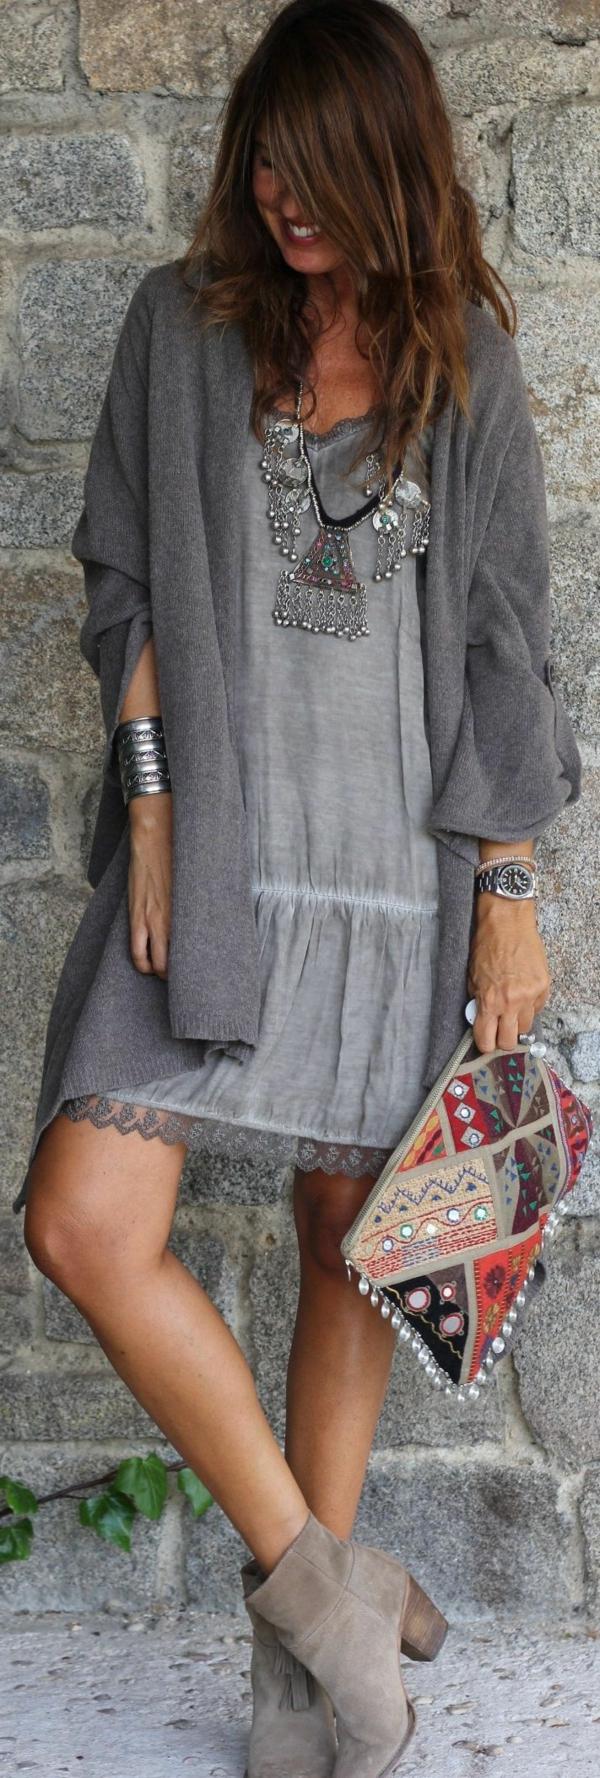 Comment adopter le style boheme chic - Vetement hippie chic femme ...